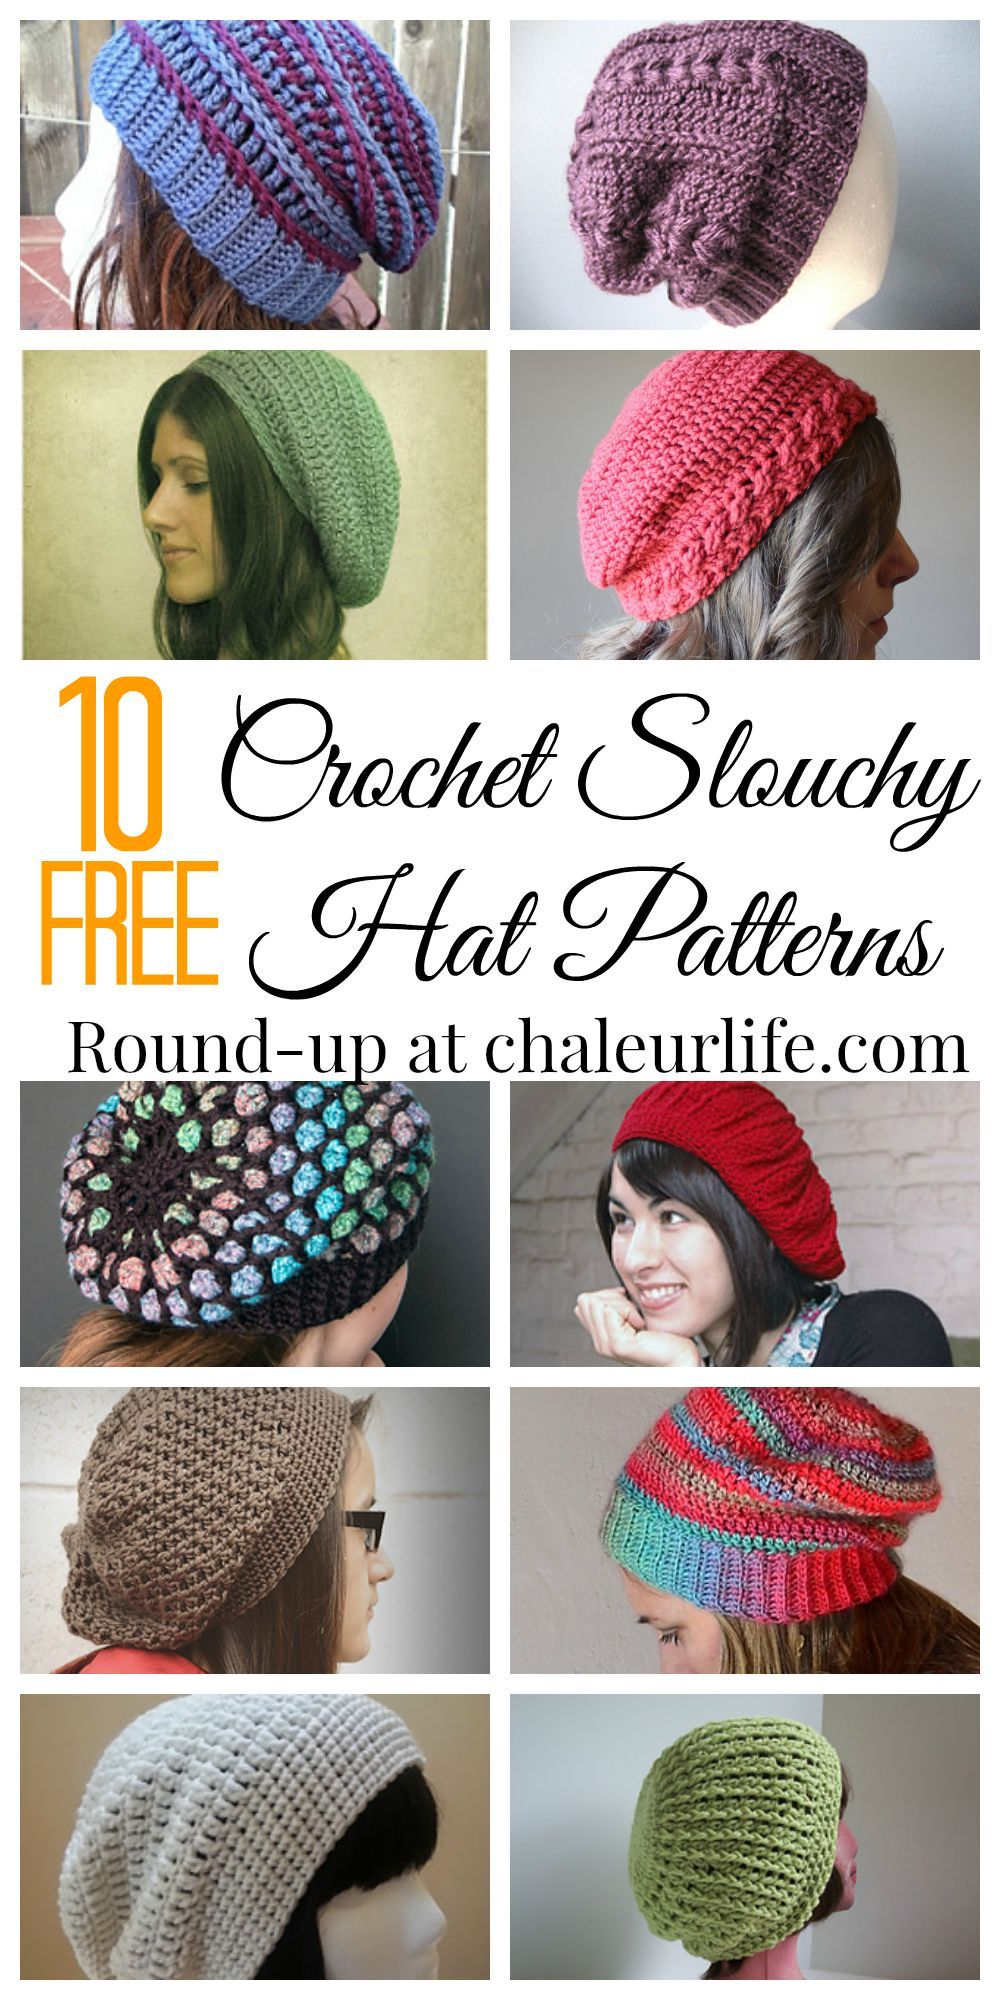 d3dcd5efe8bc7 10 Free Crochet Slouchy Hat Patterns